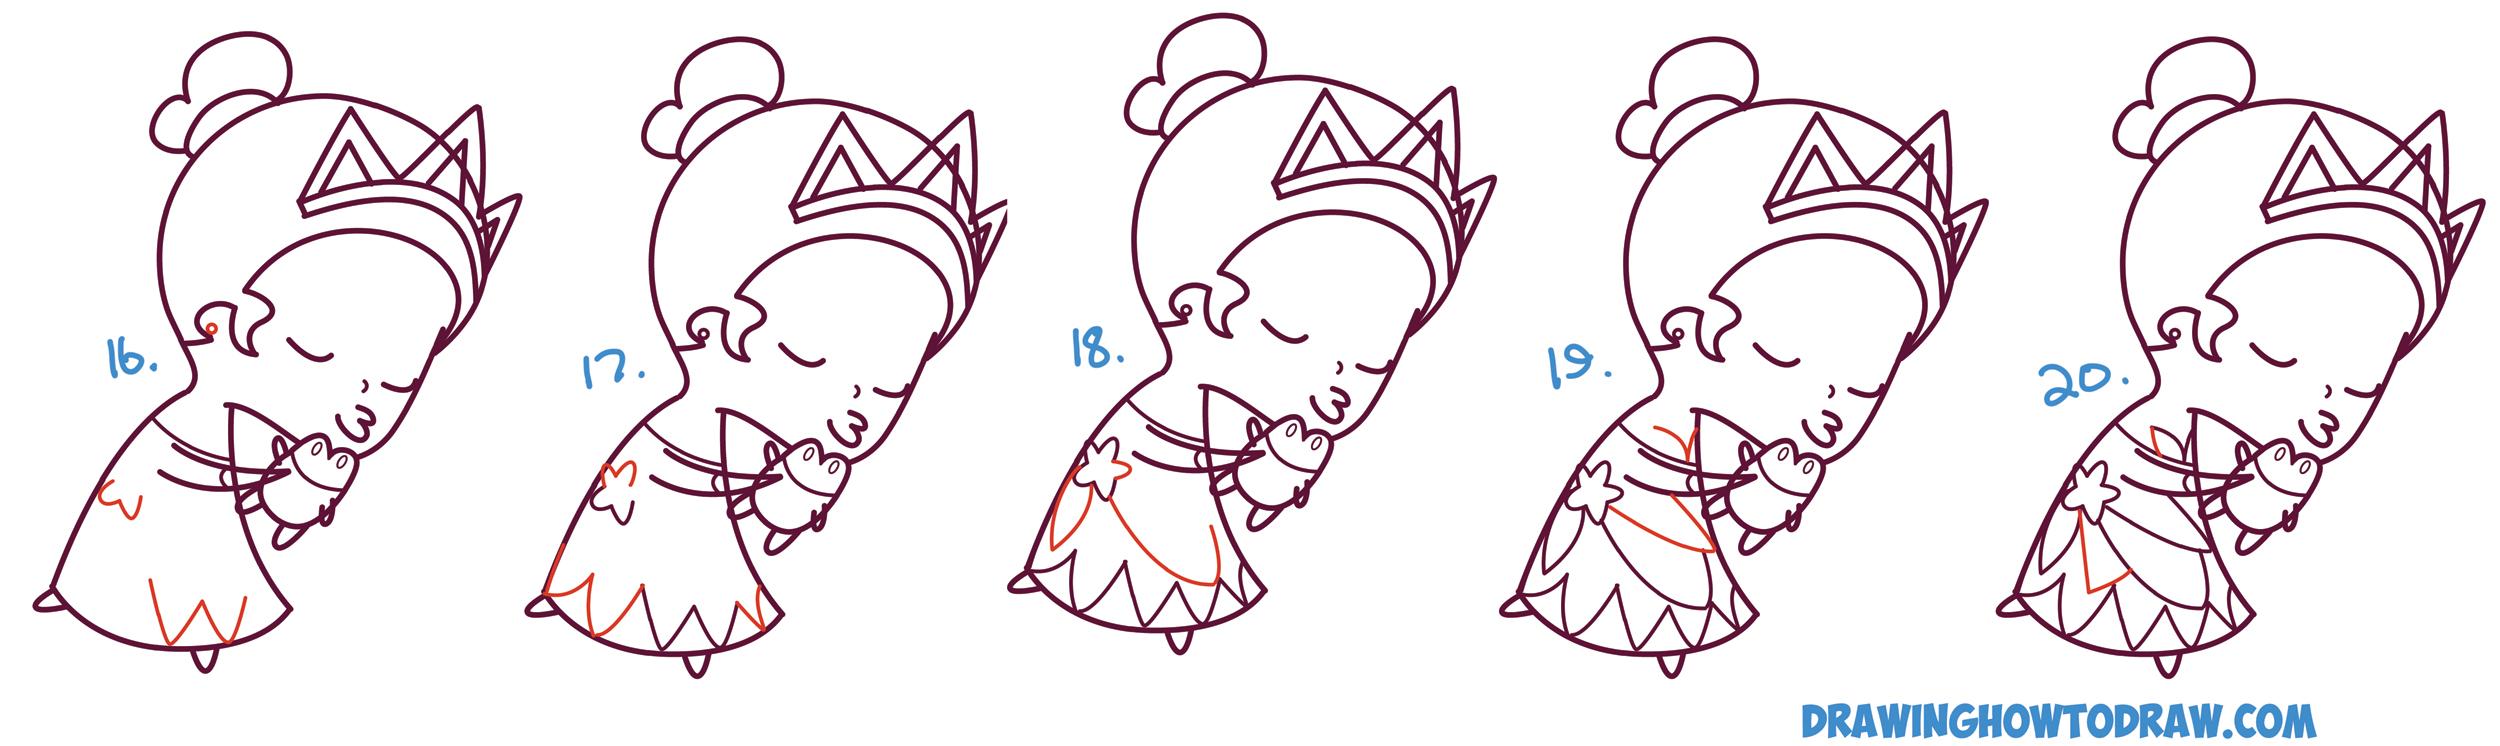 2500x746 How To Draw Princess Tiana Kissing A Frog (Cute Chibi Kawaii